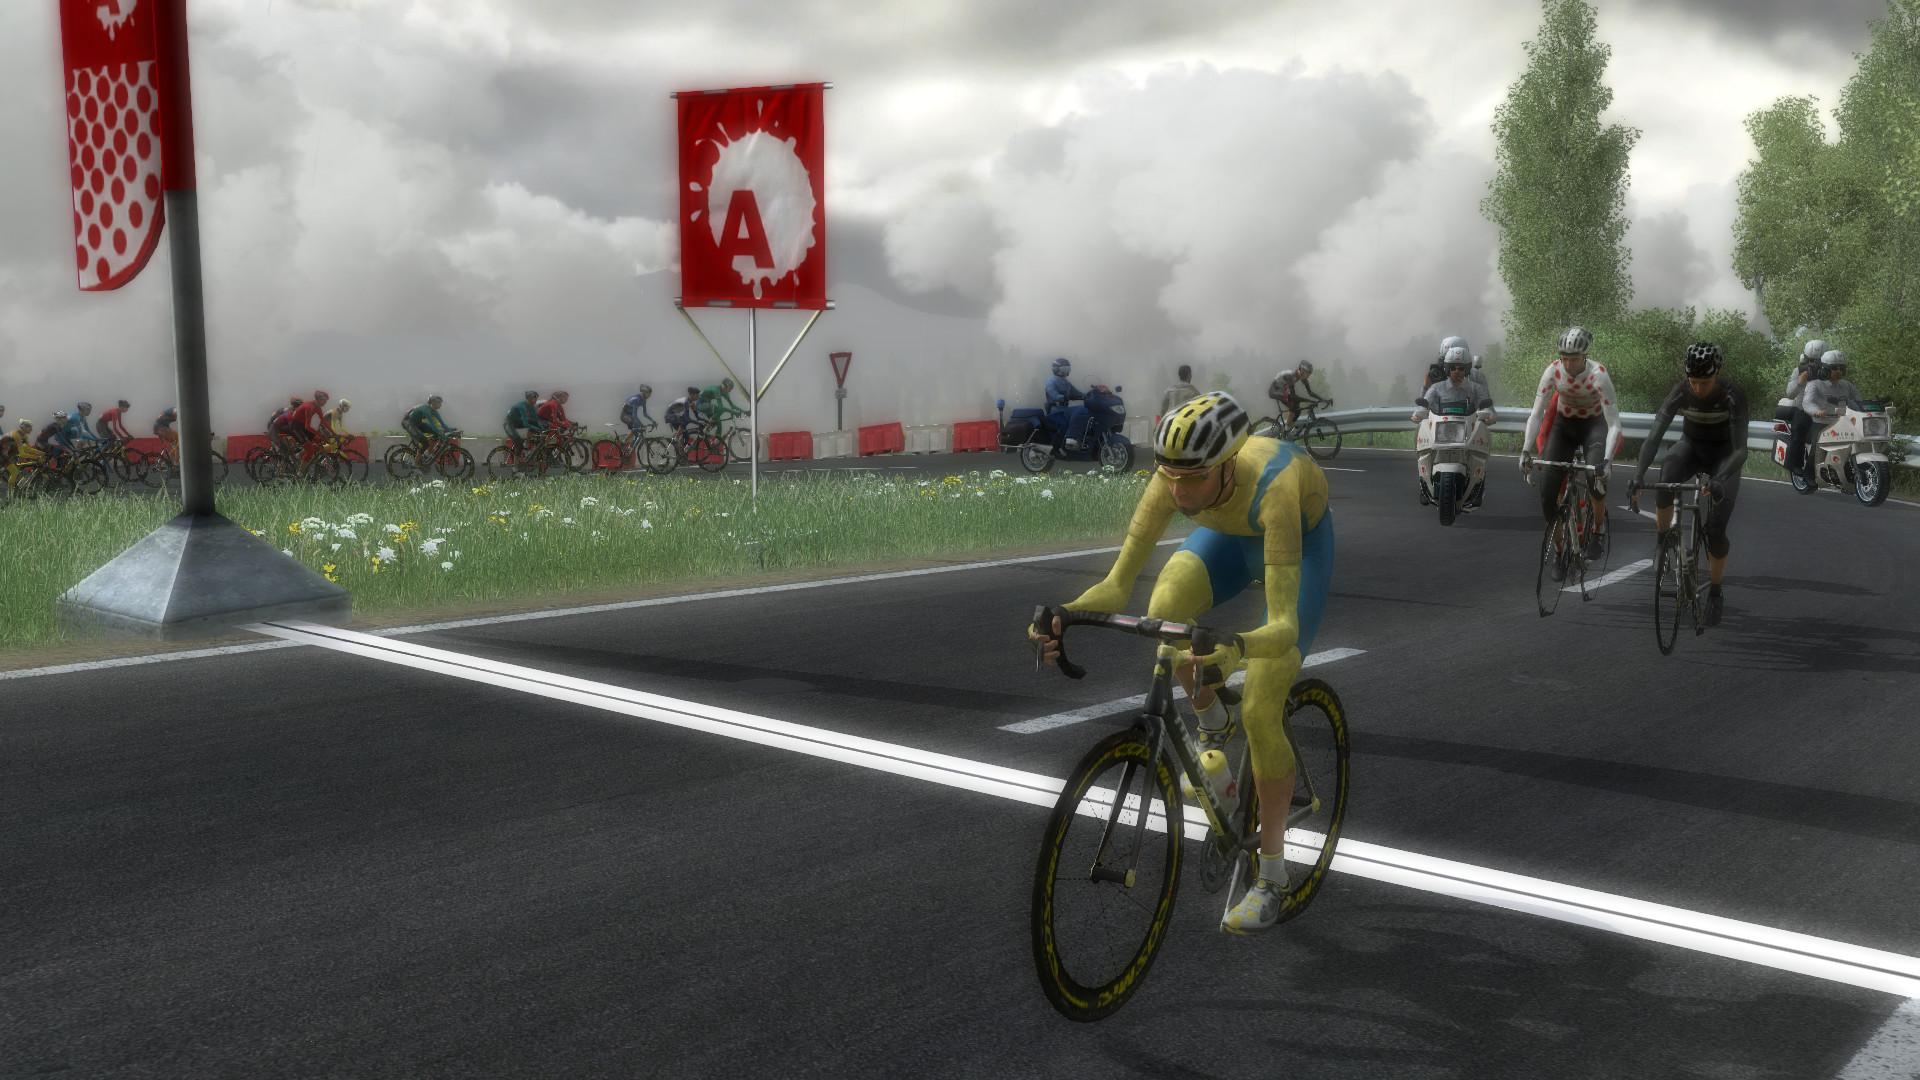 pcmdaily.com/images/mg/2019/Races/PTHC/Pologne/E5/17.jpg